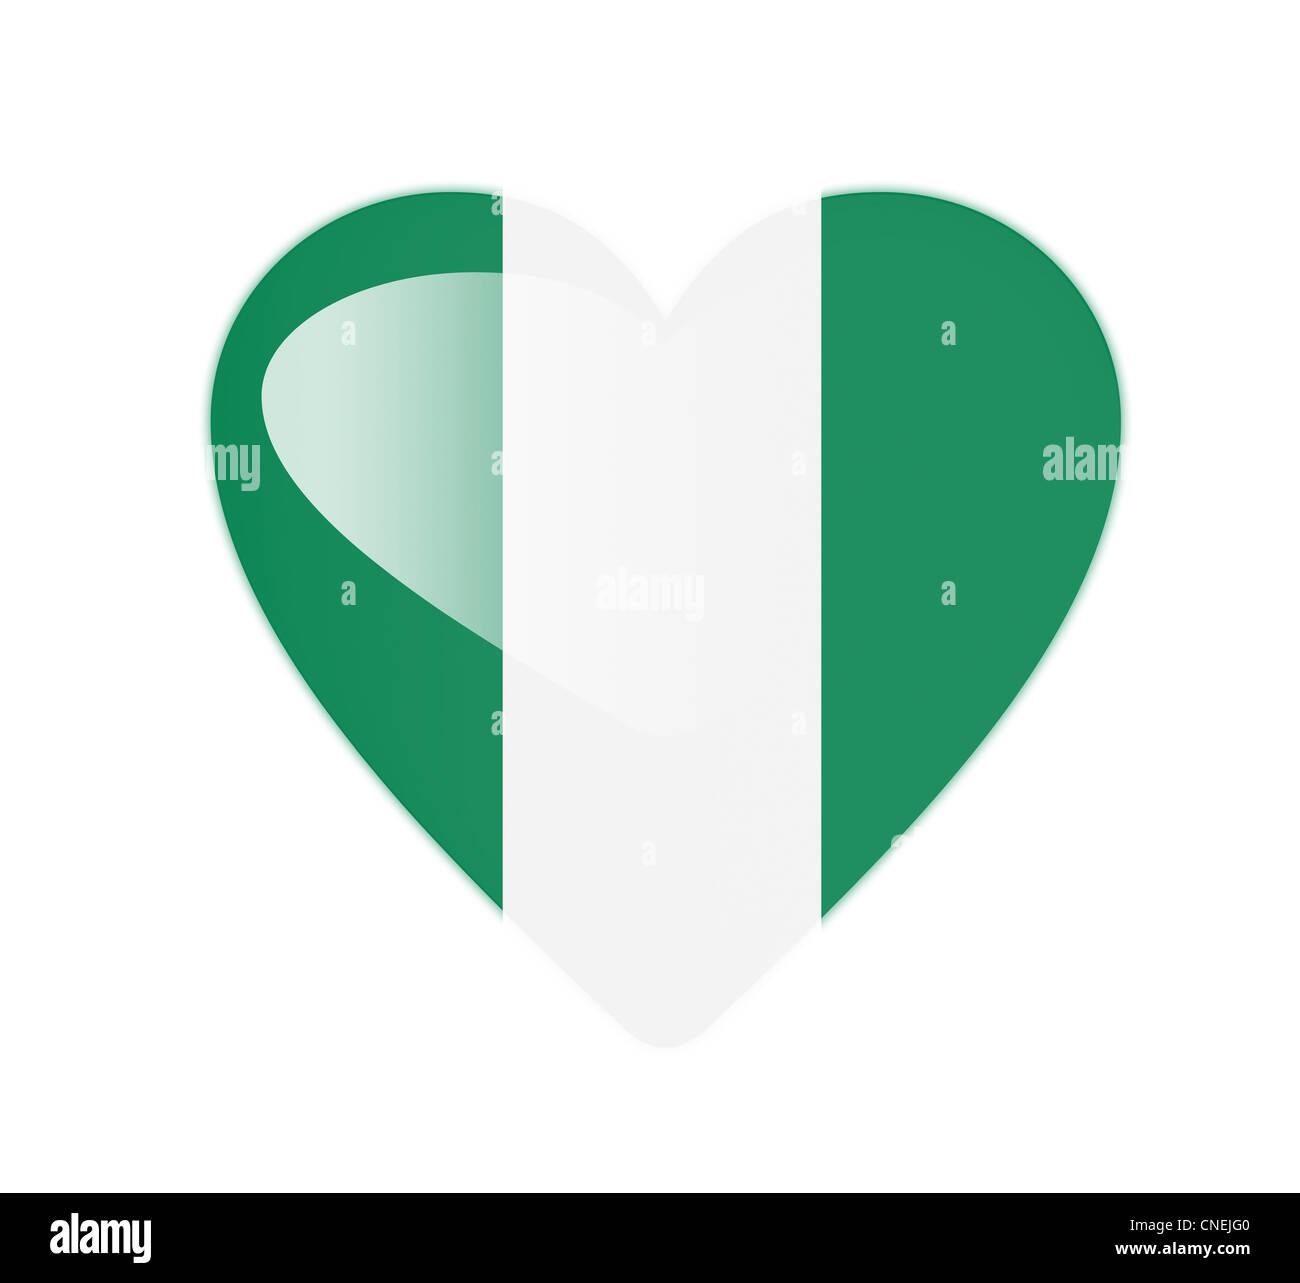 Vector nigeria flag heart glossy stock photos vector nigeria flag nigeria 3d heart shaped flag stock image ccuart Choice Image